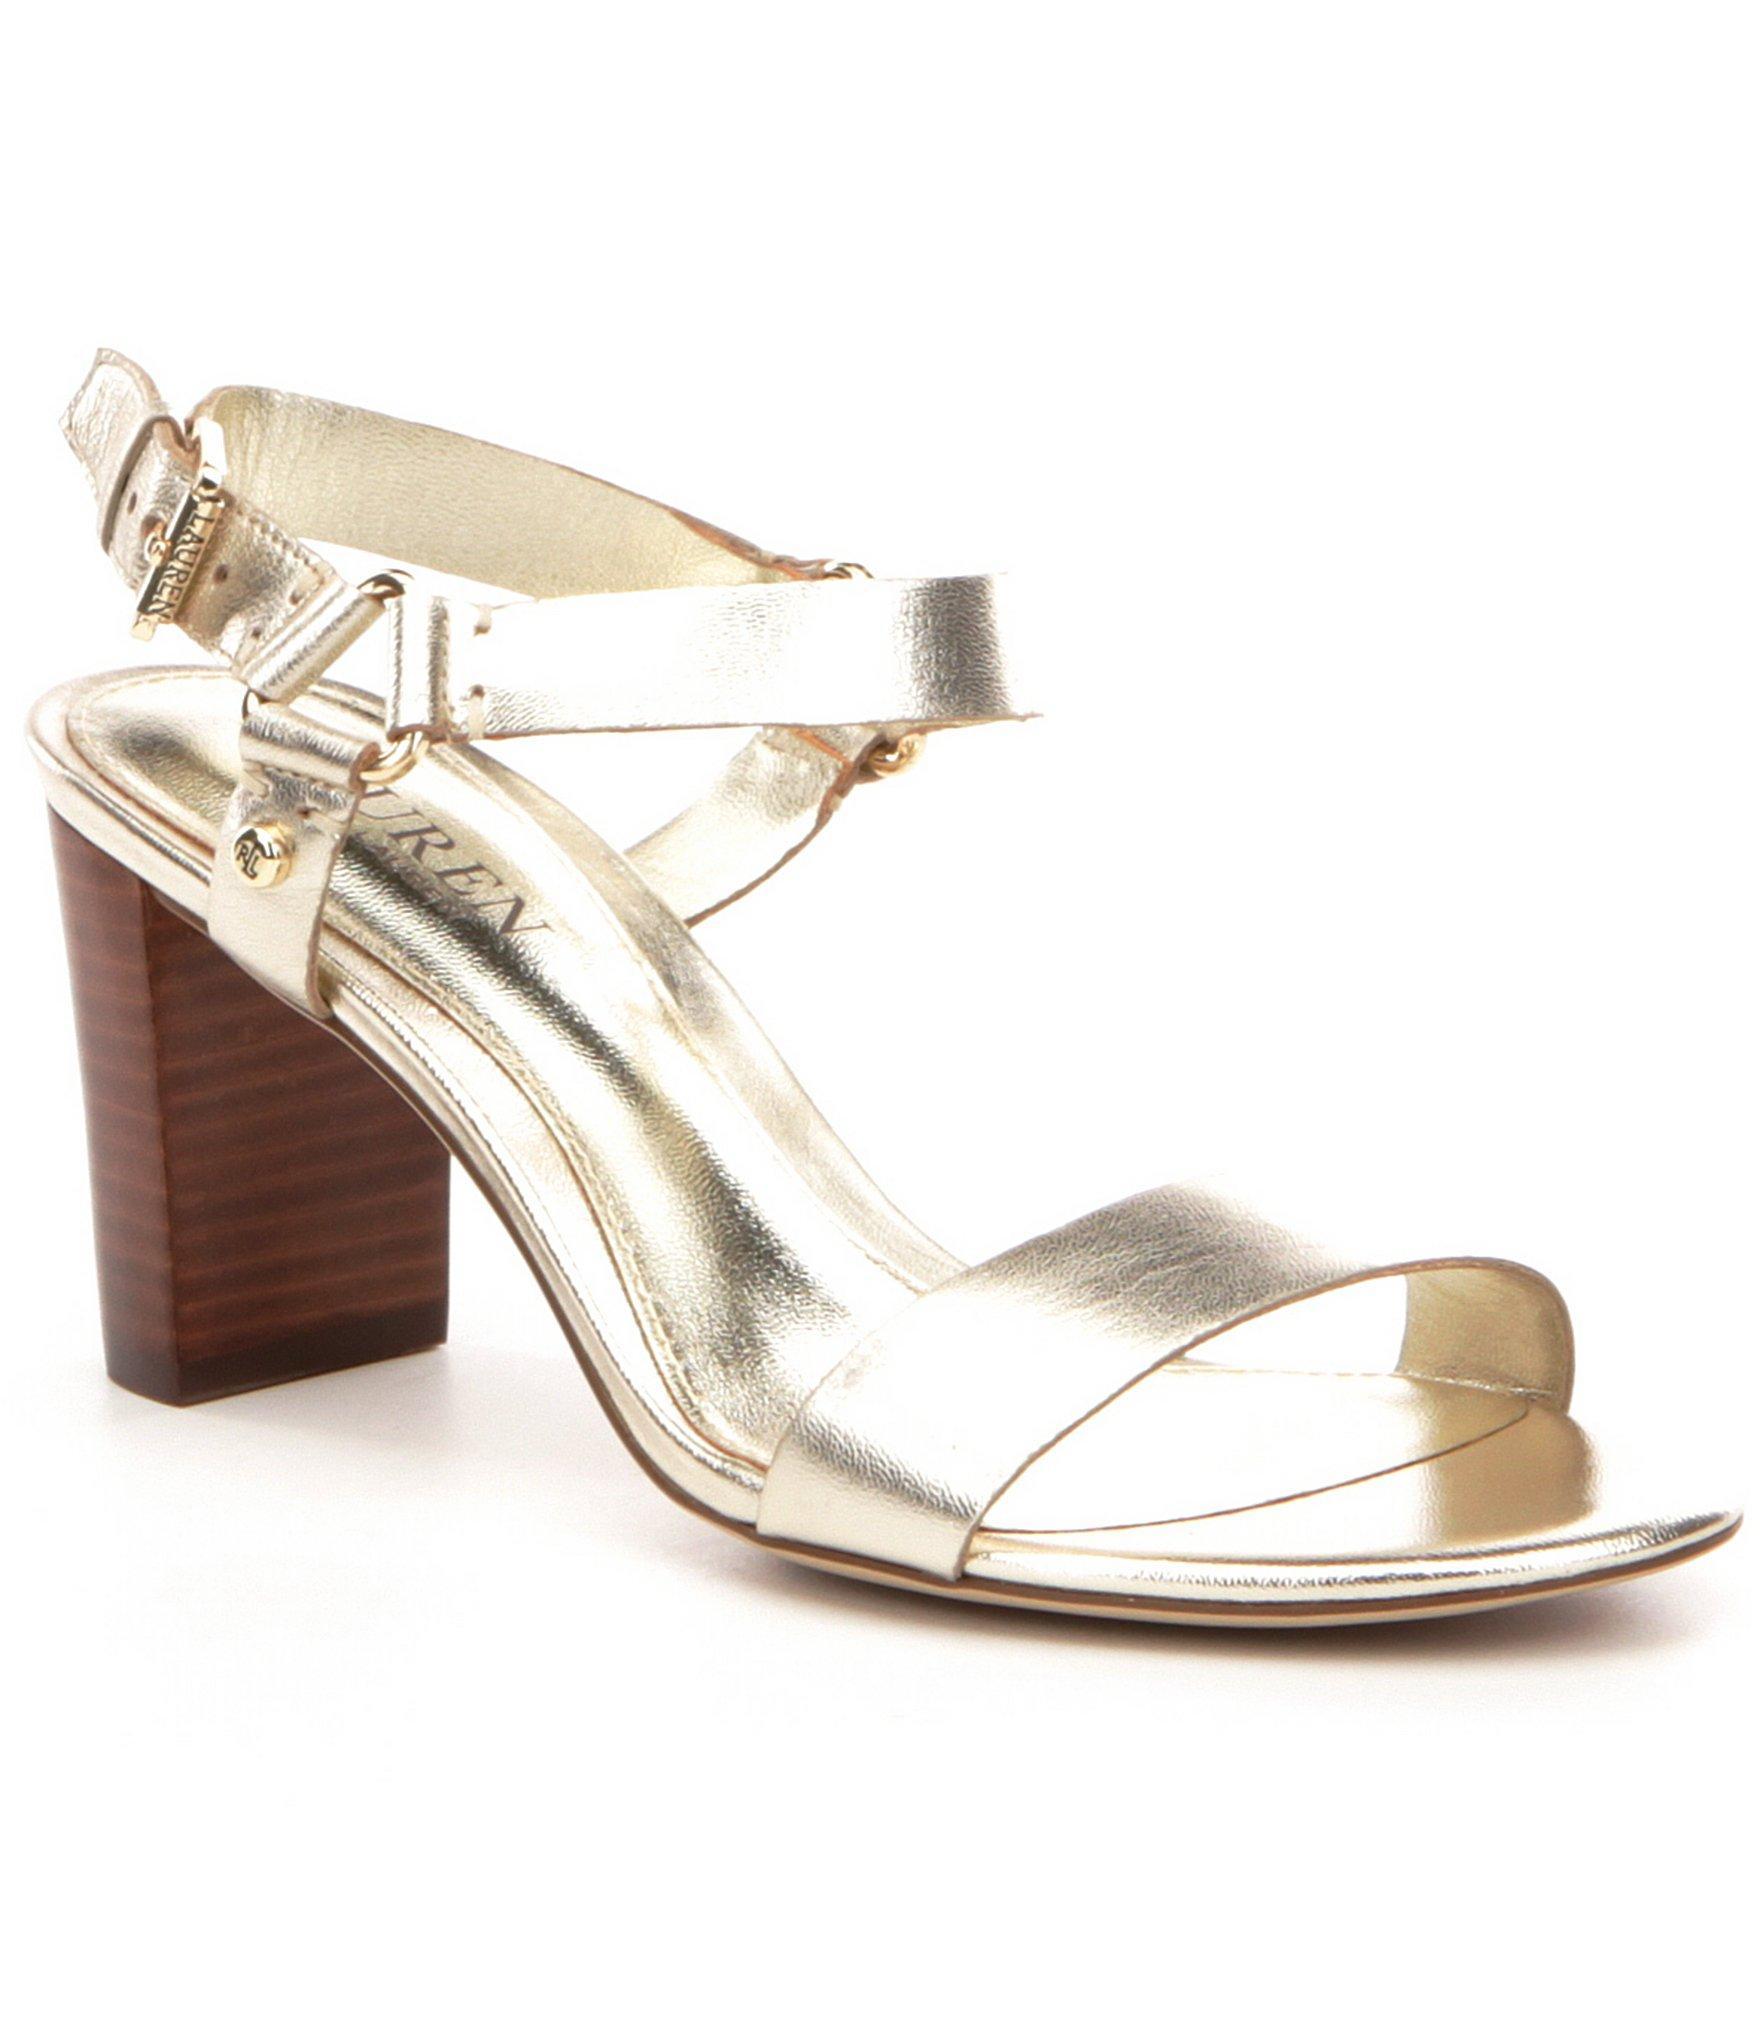 7cd642fd3fe Lyst - Lauren by Ralph Lauren Harri City Leather Ankle Strap Sandals